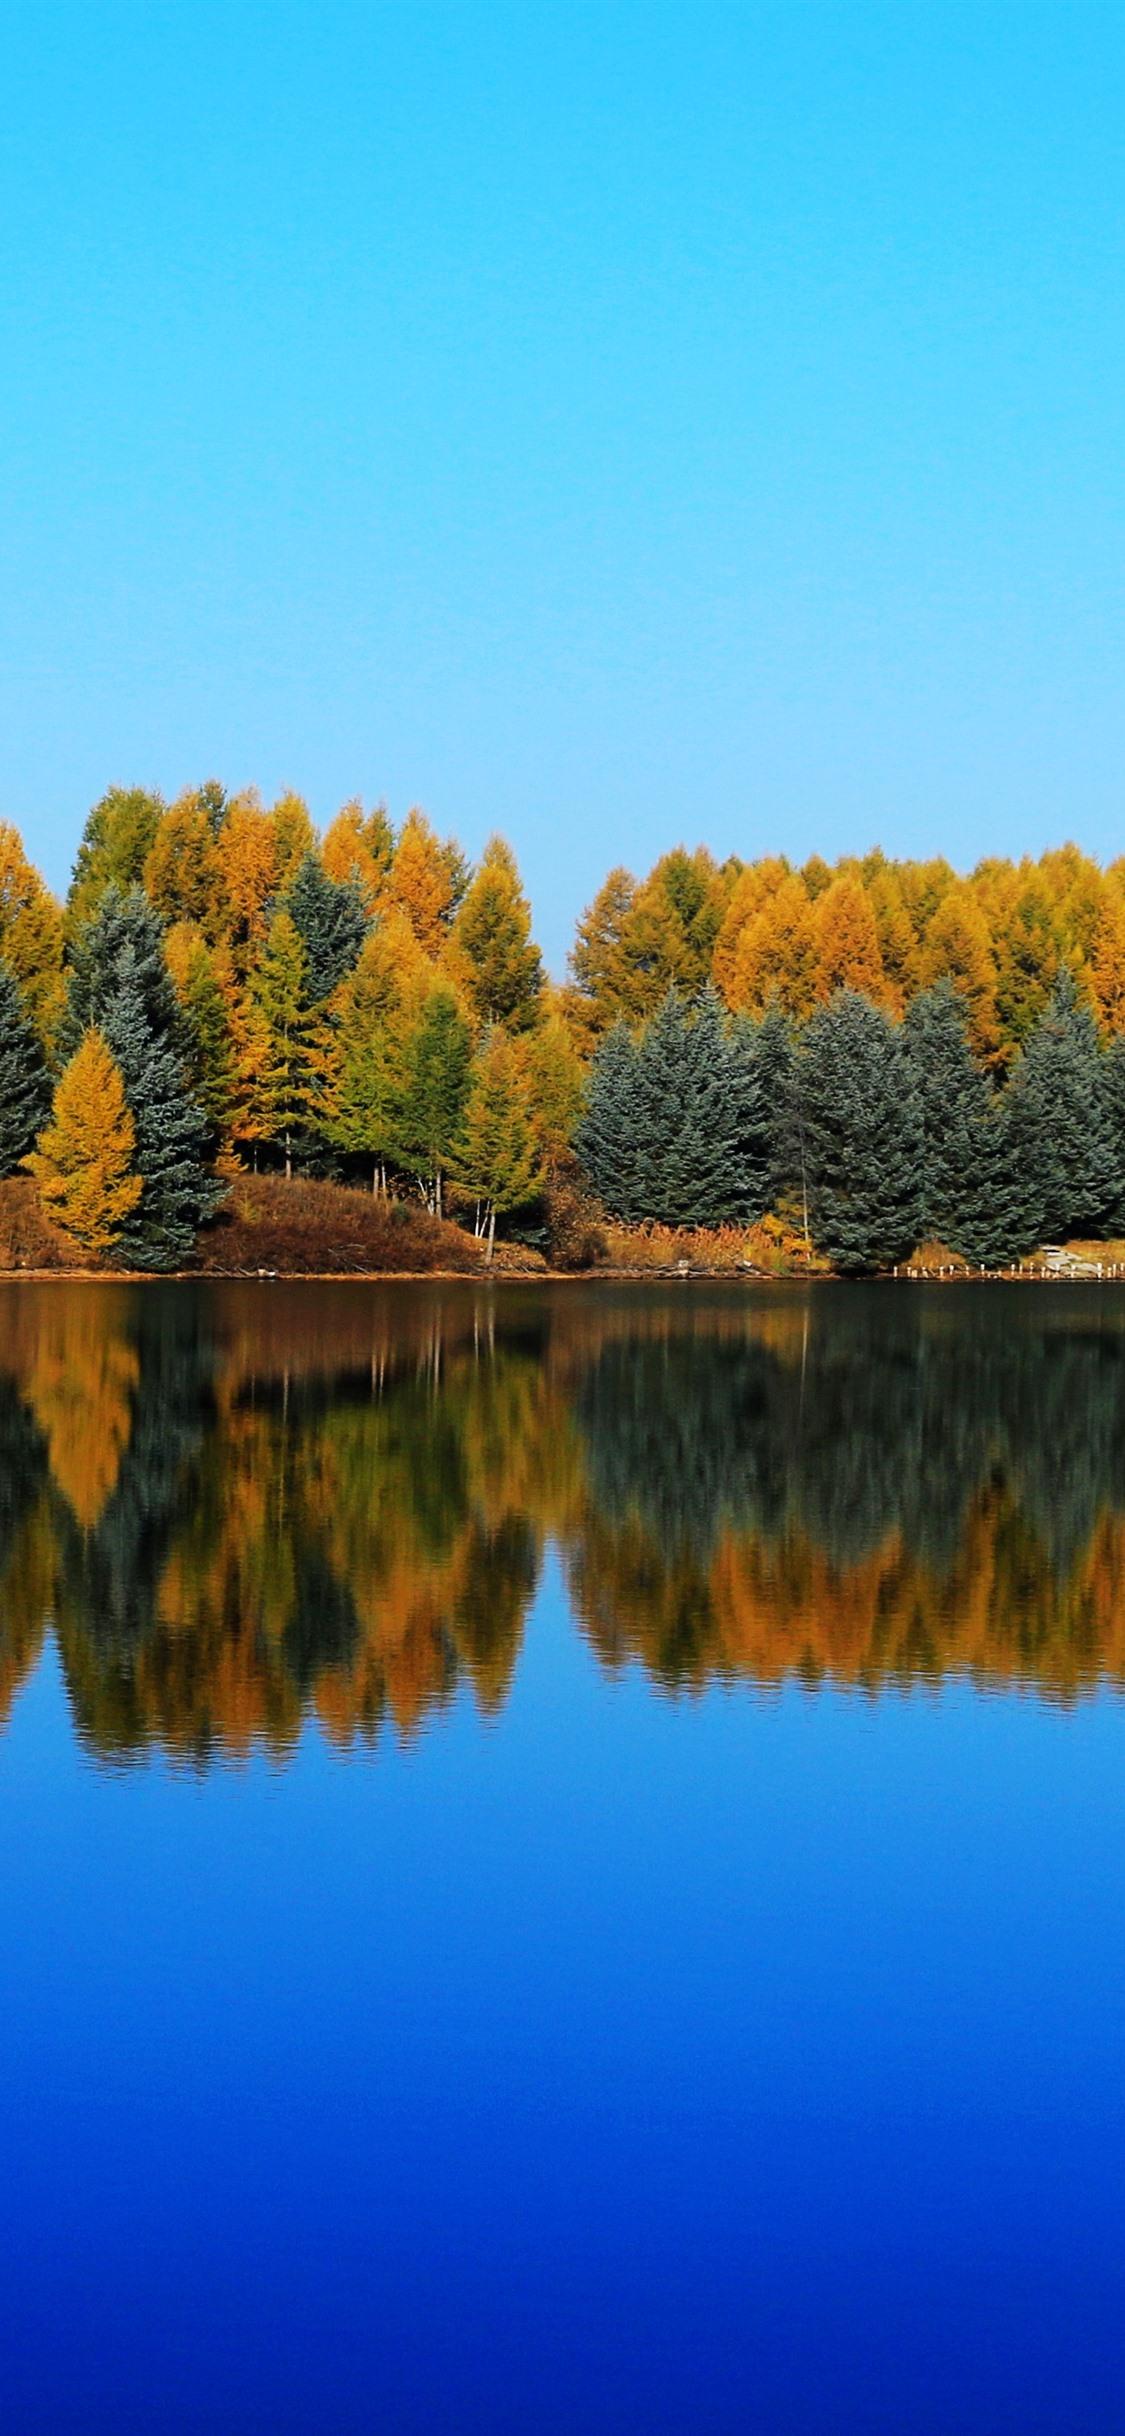 Saihanba Shenlongtan Trees Lake Water Reflection Autumn 1125x2436 Iphone 11 Pro Xs X Wallpaper Background Picture Image